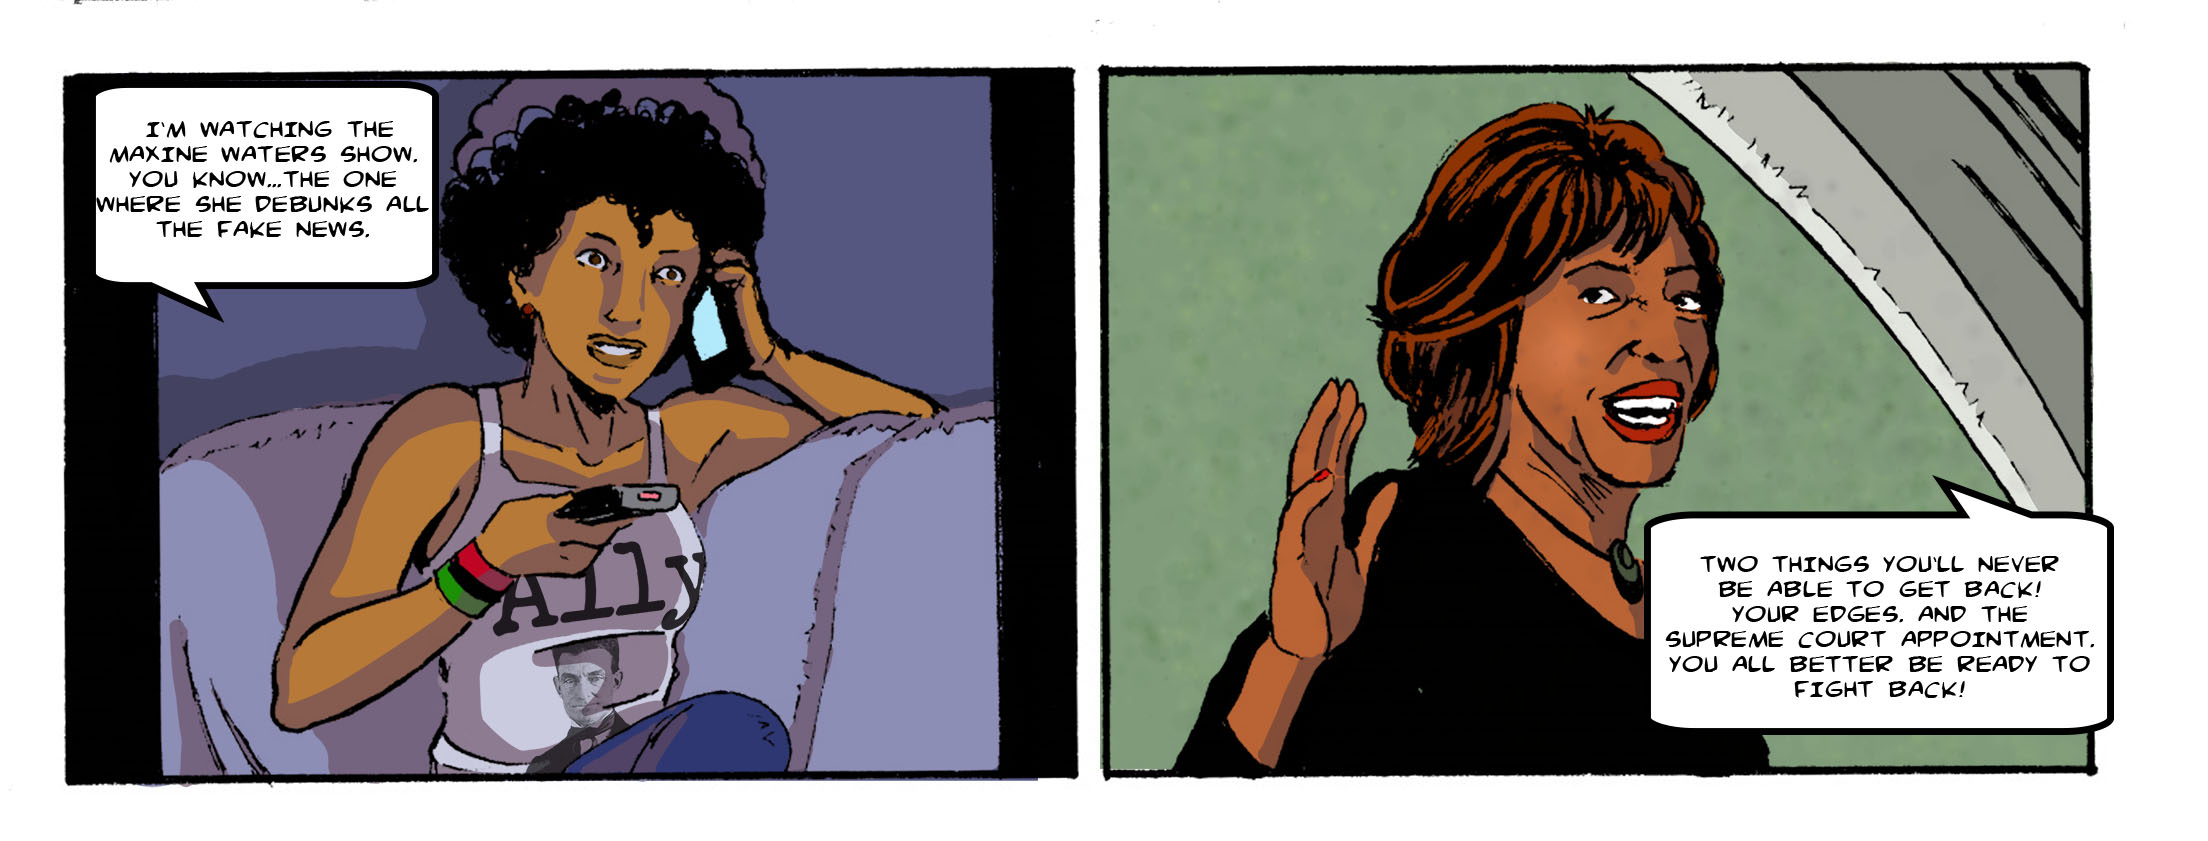 (H)af Comic Strip #80 updated.jpg